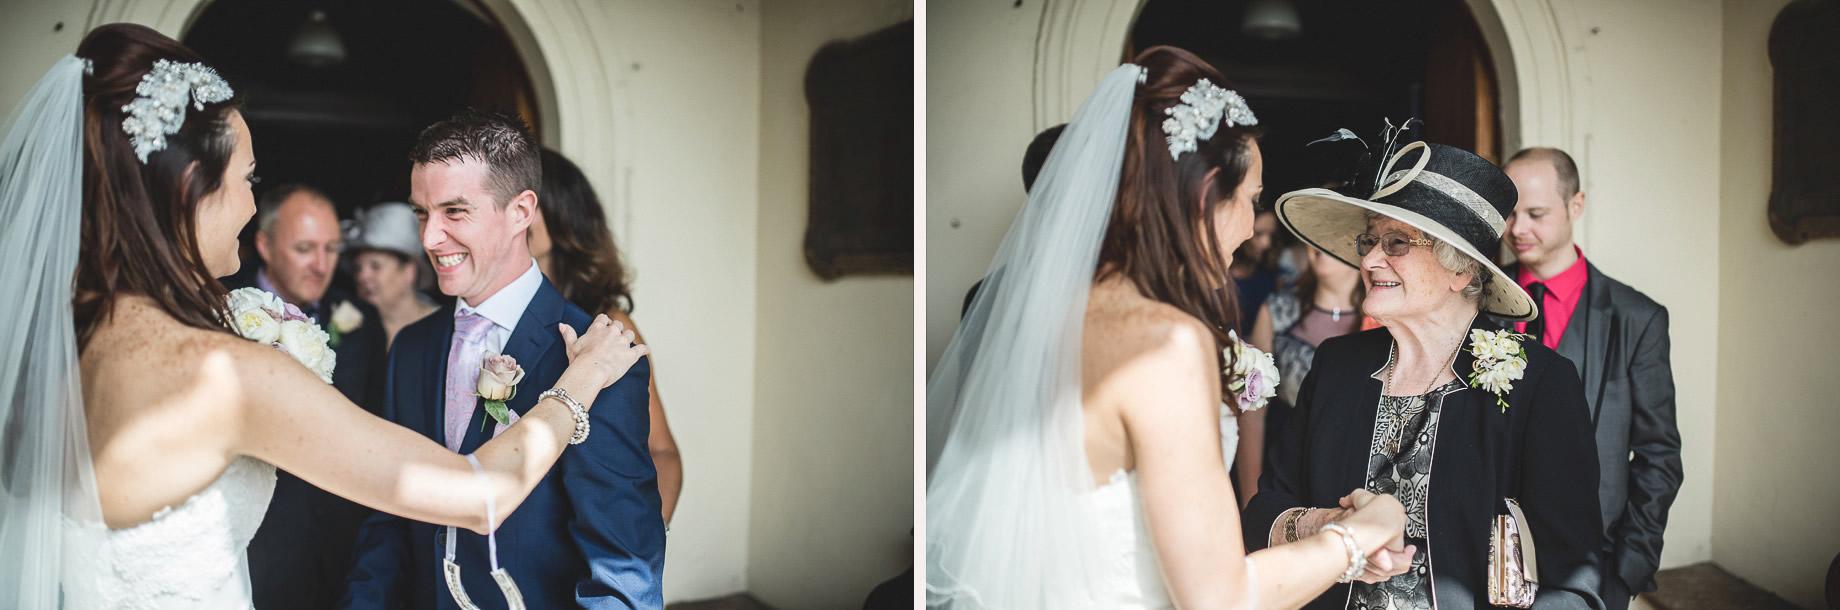 Helen and Matt's Wedding at Mitton Hall 050